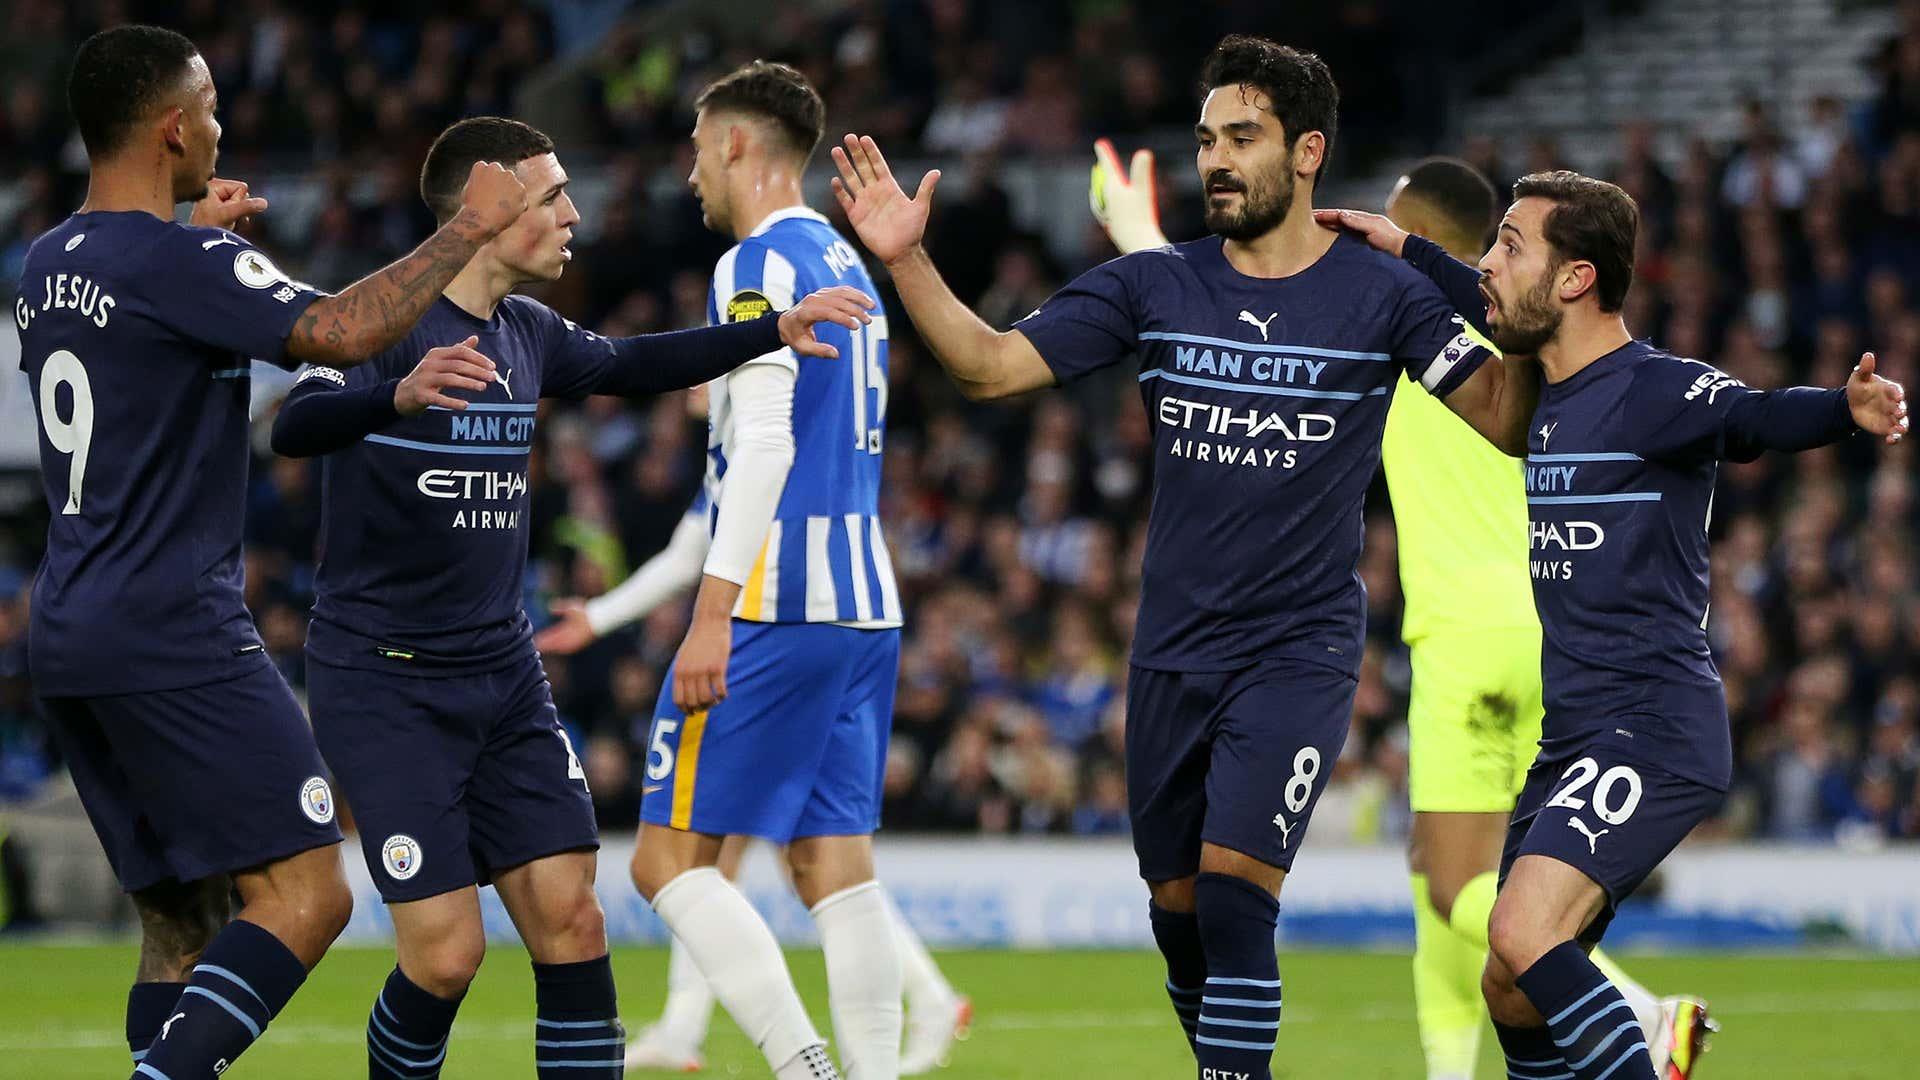 Brighton & Hove Albion vs. Manchester City Live-Kommentar und Ergebnis, 23.10.21, Premier League | Goal.com